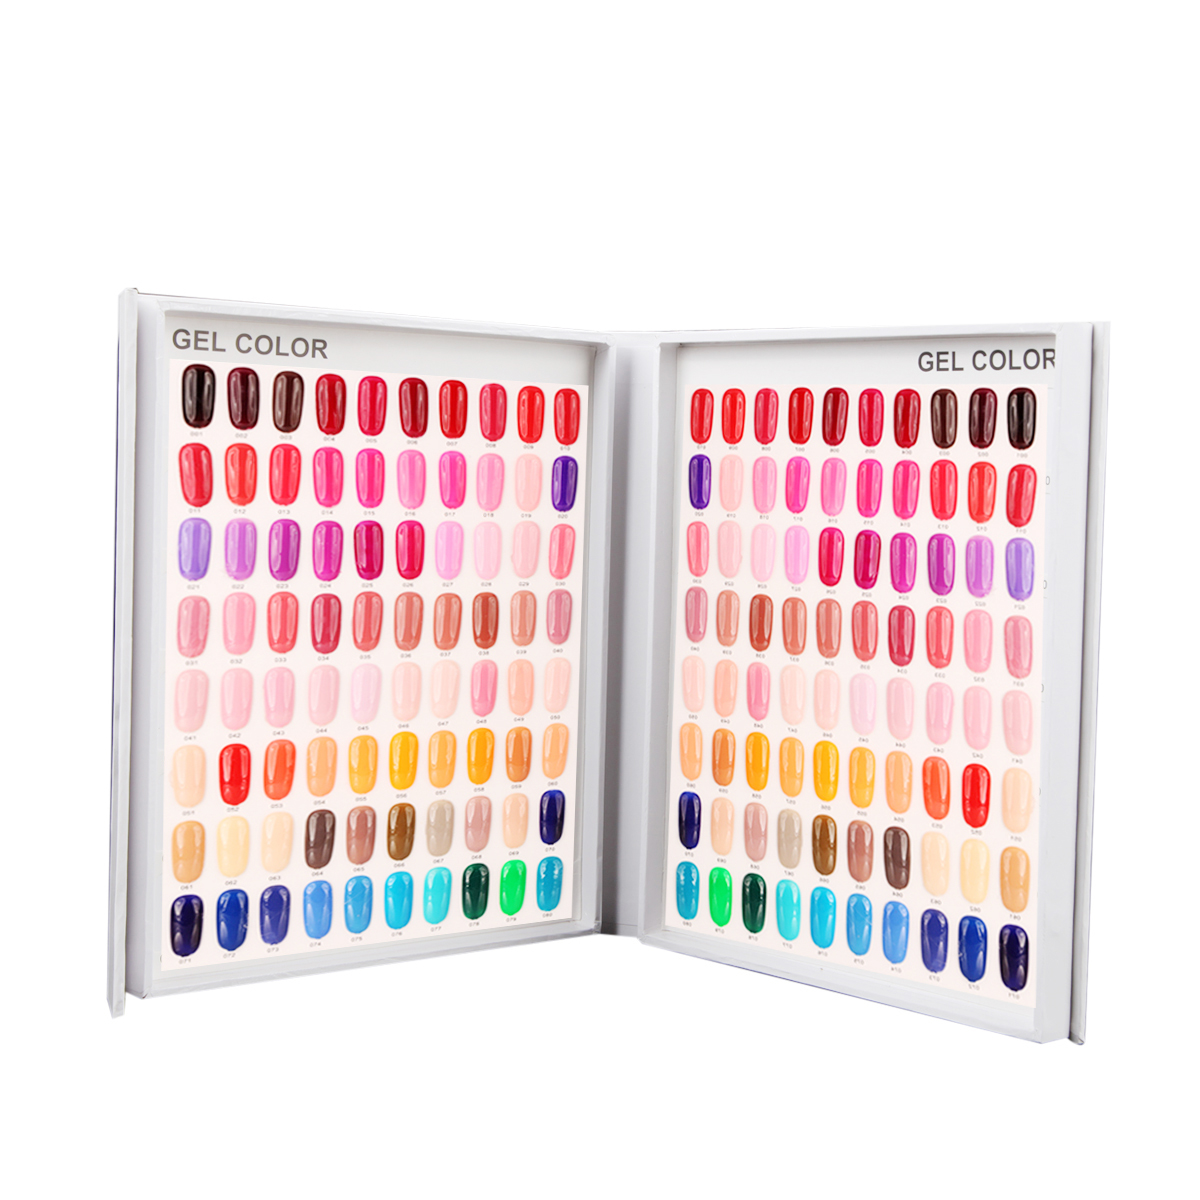 120 kleuren nail art gel polish display boek kaartkaart nagelsalon - Nagel kunst